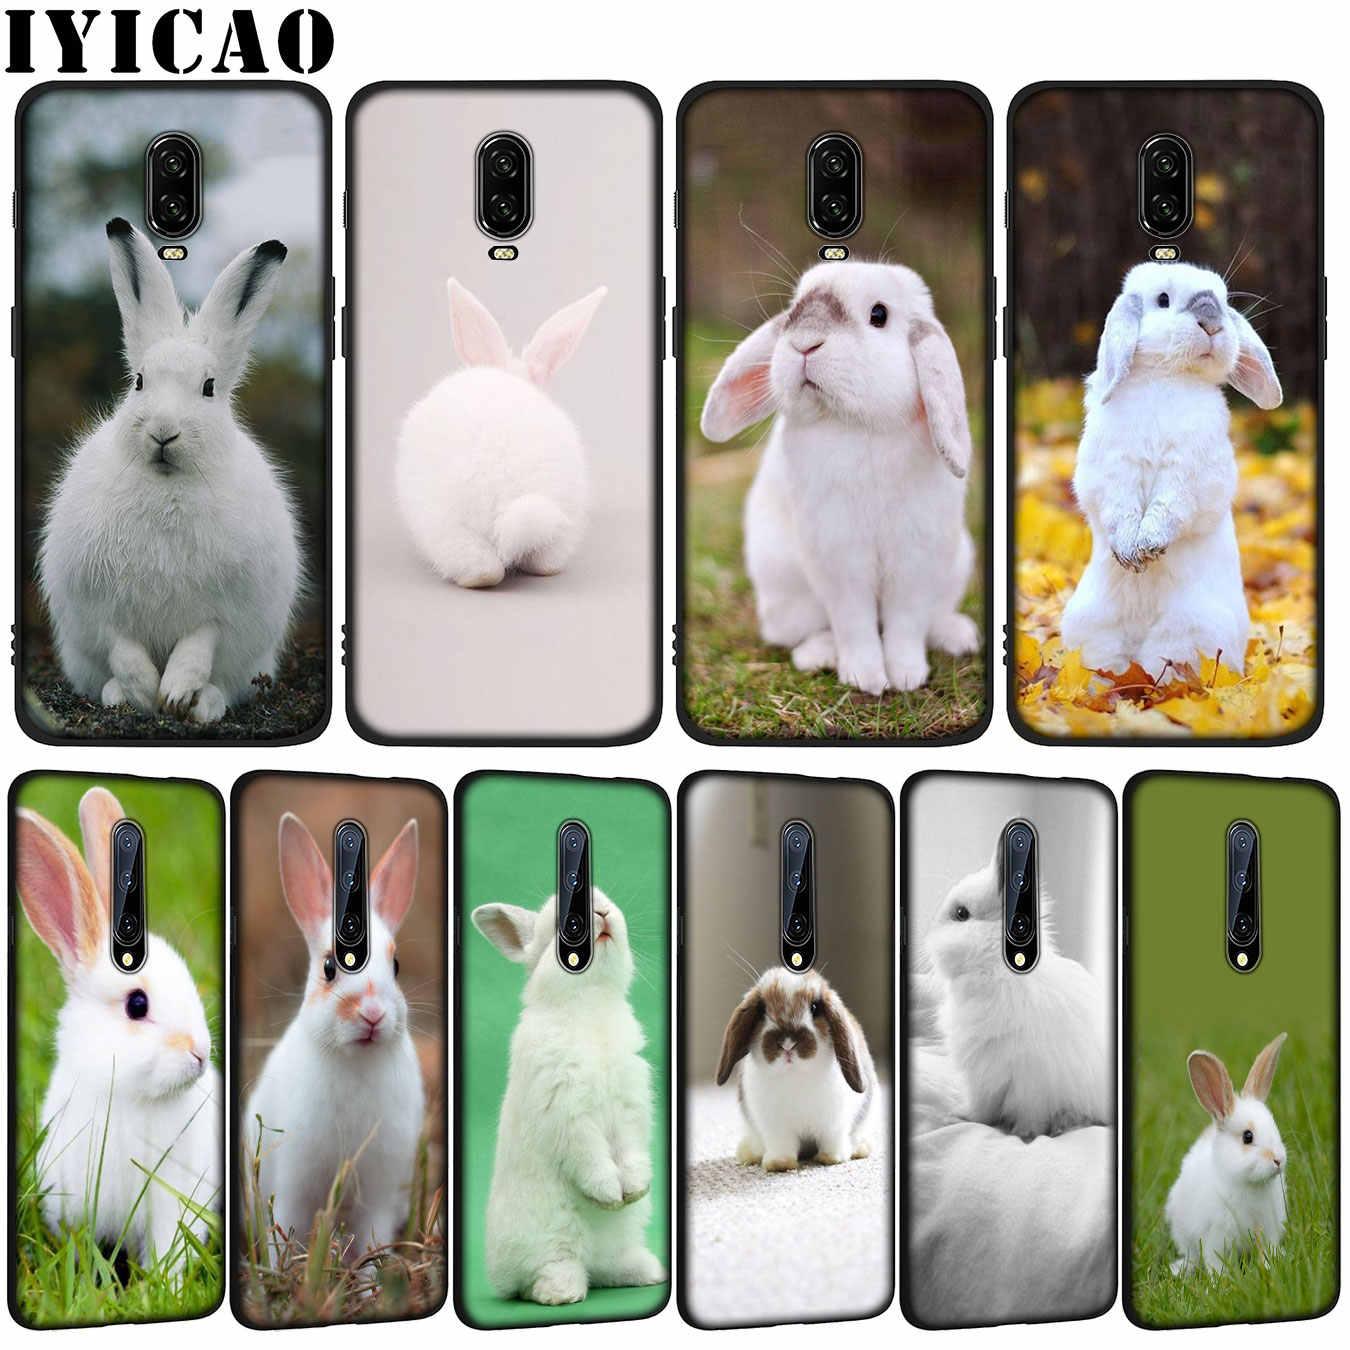 Bonita funda de teléfono de silicona blanca de conejo suave de TPU negro para OnePlus 7T 7 Pro 6 6T 5 5T One Plus 7Pro